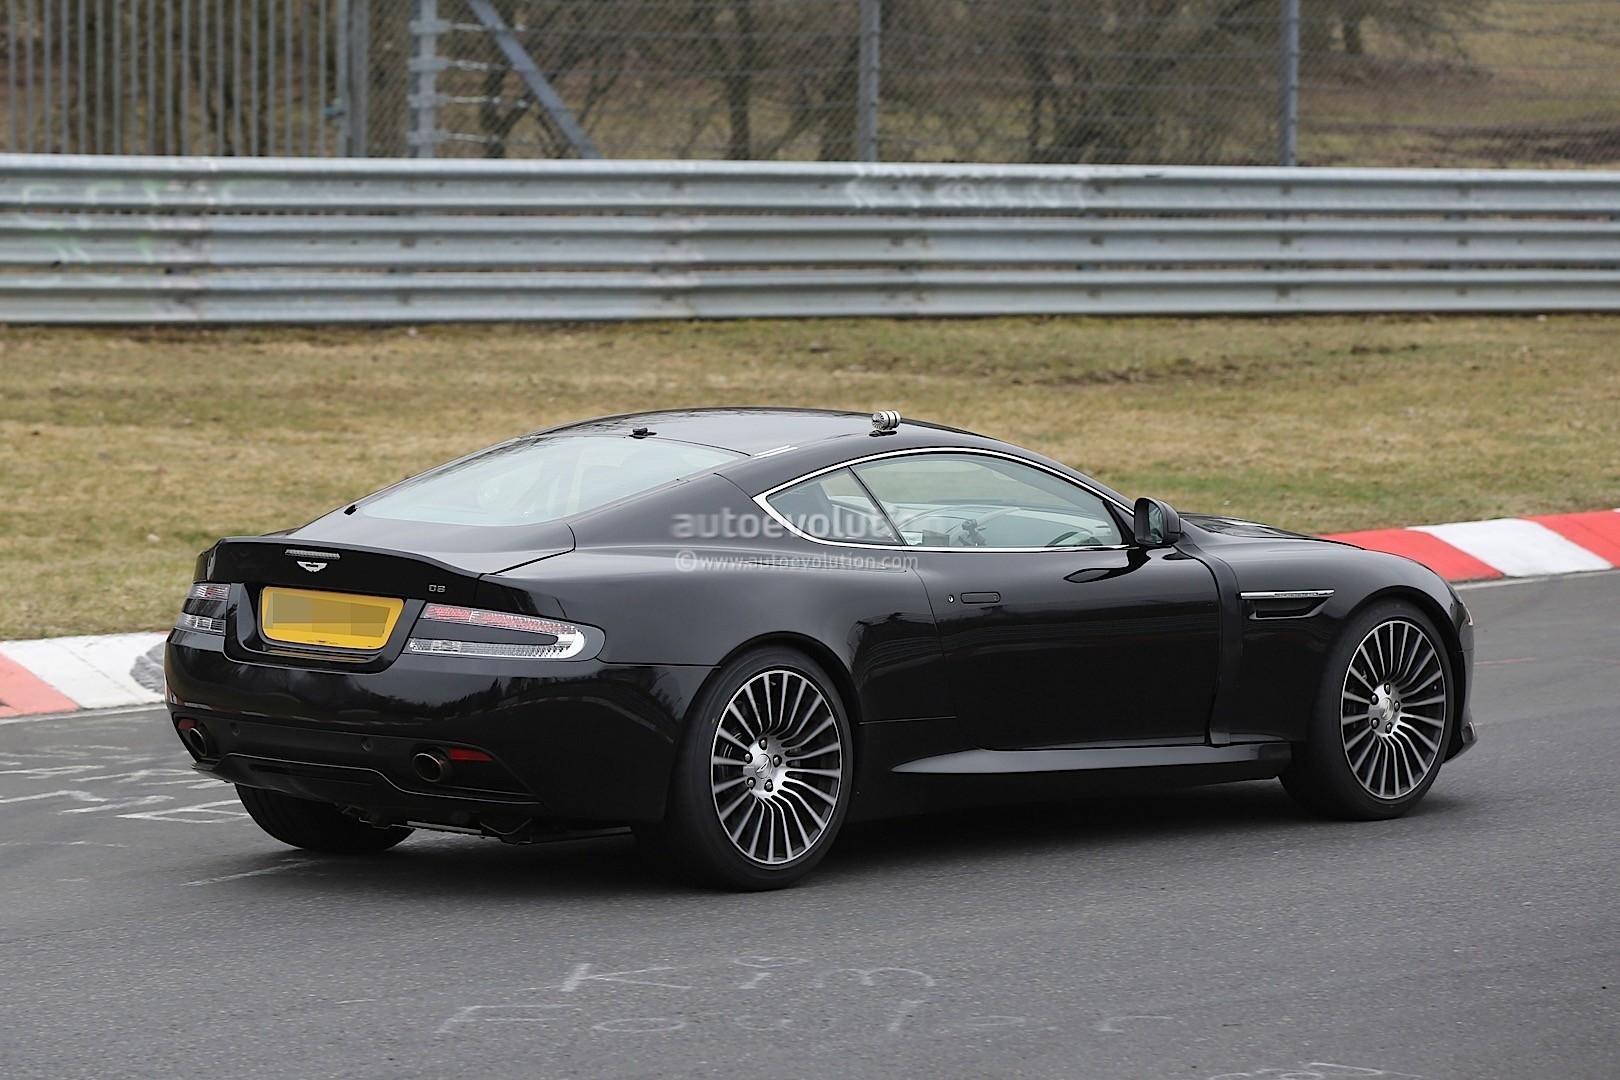 NextGen Aston Martin Models Could Use AMG Turbocharged Engines - Aston martin models